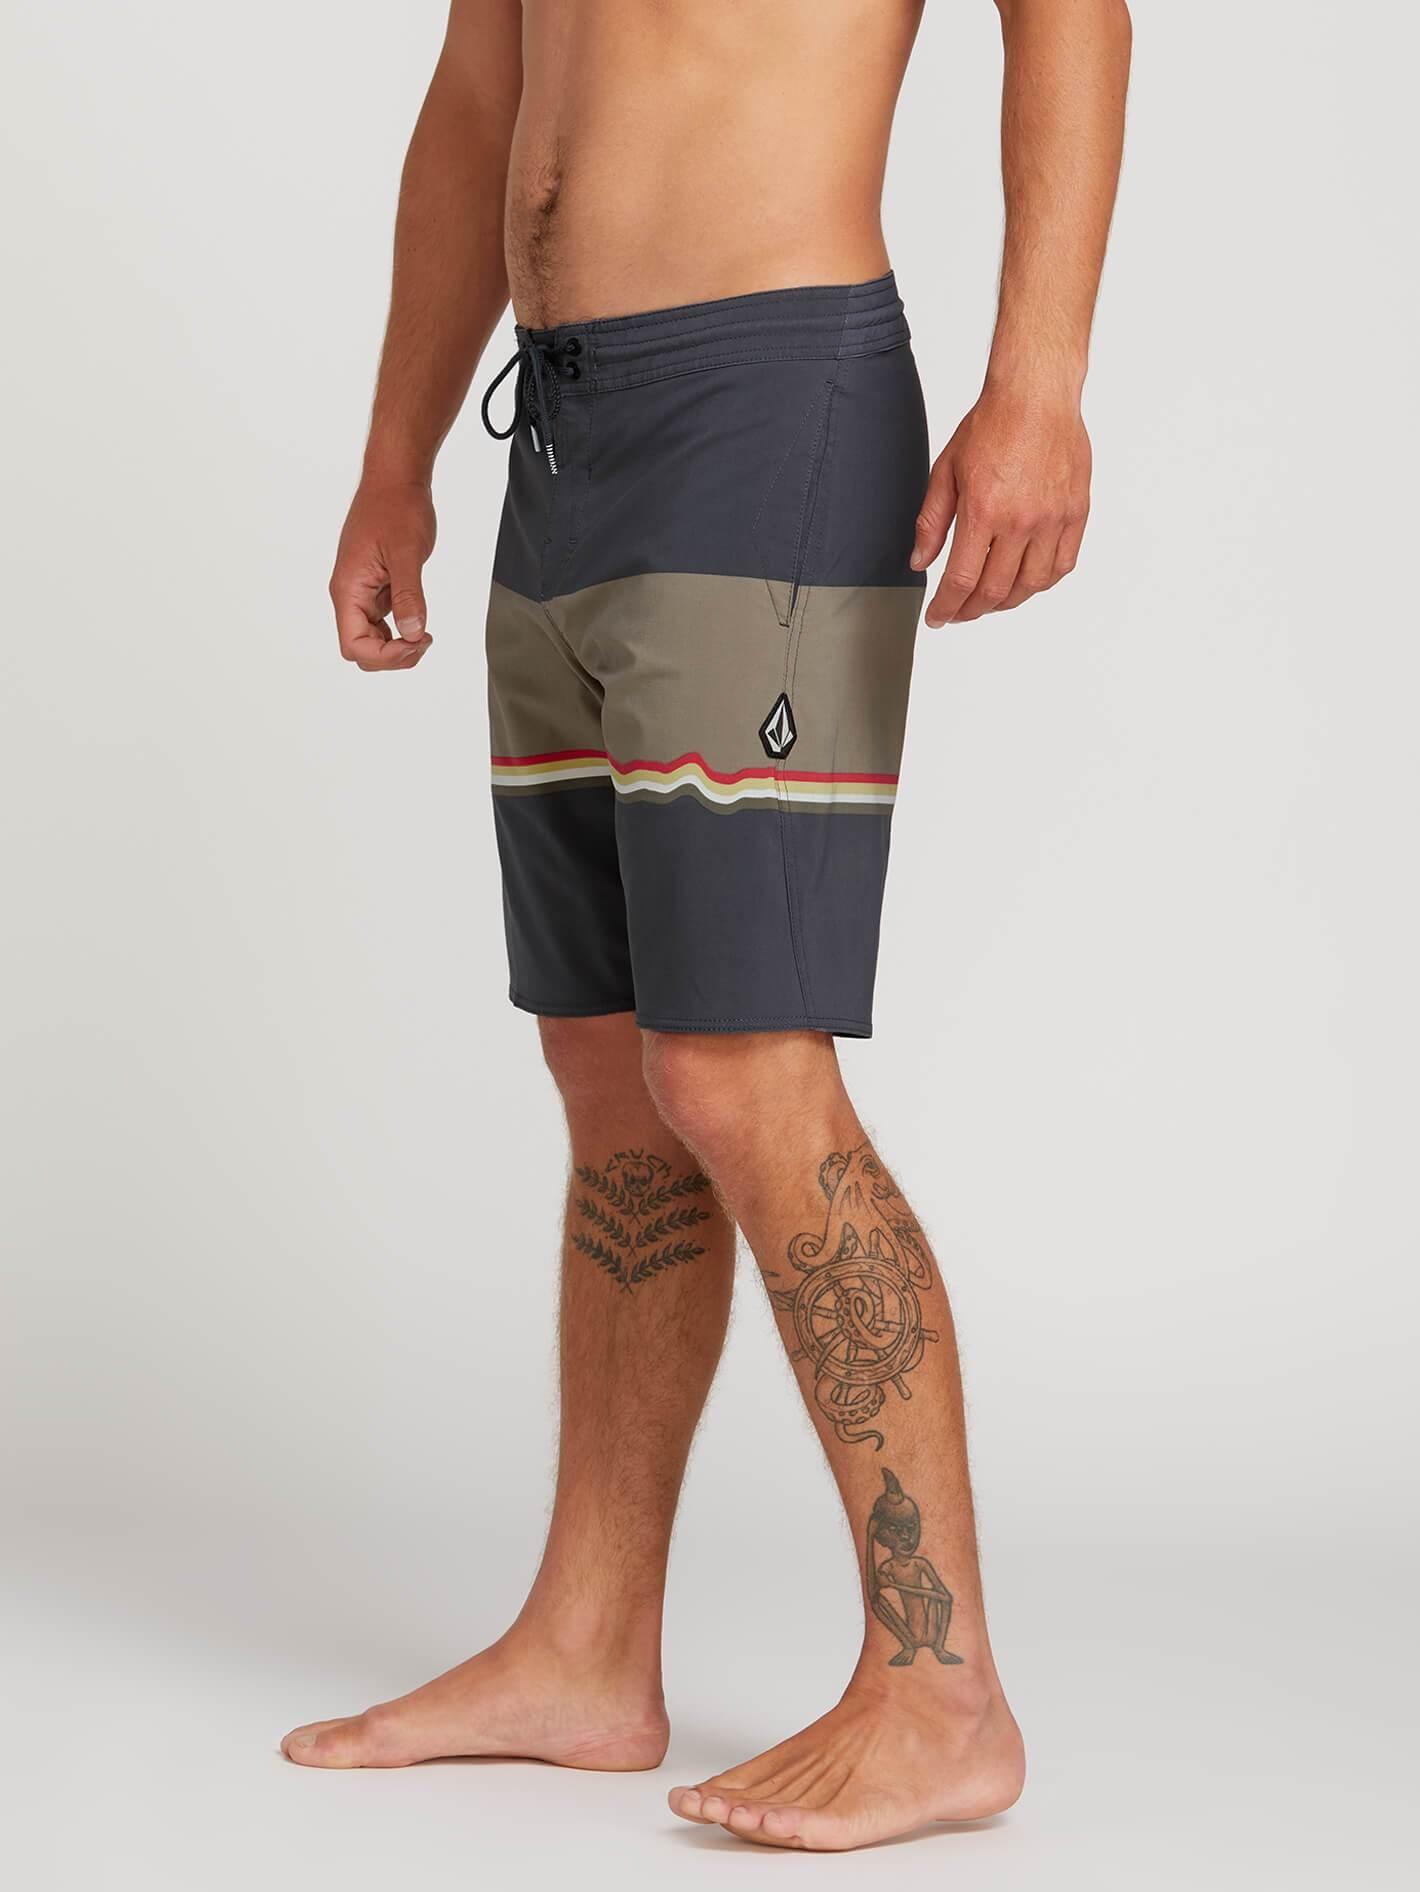 86c7ee92d9 VOLCOM 3 Quarta Stoney Board Shorts - Asphalt Black. Press tab to enlarge